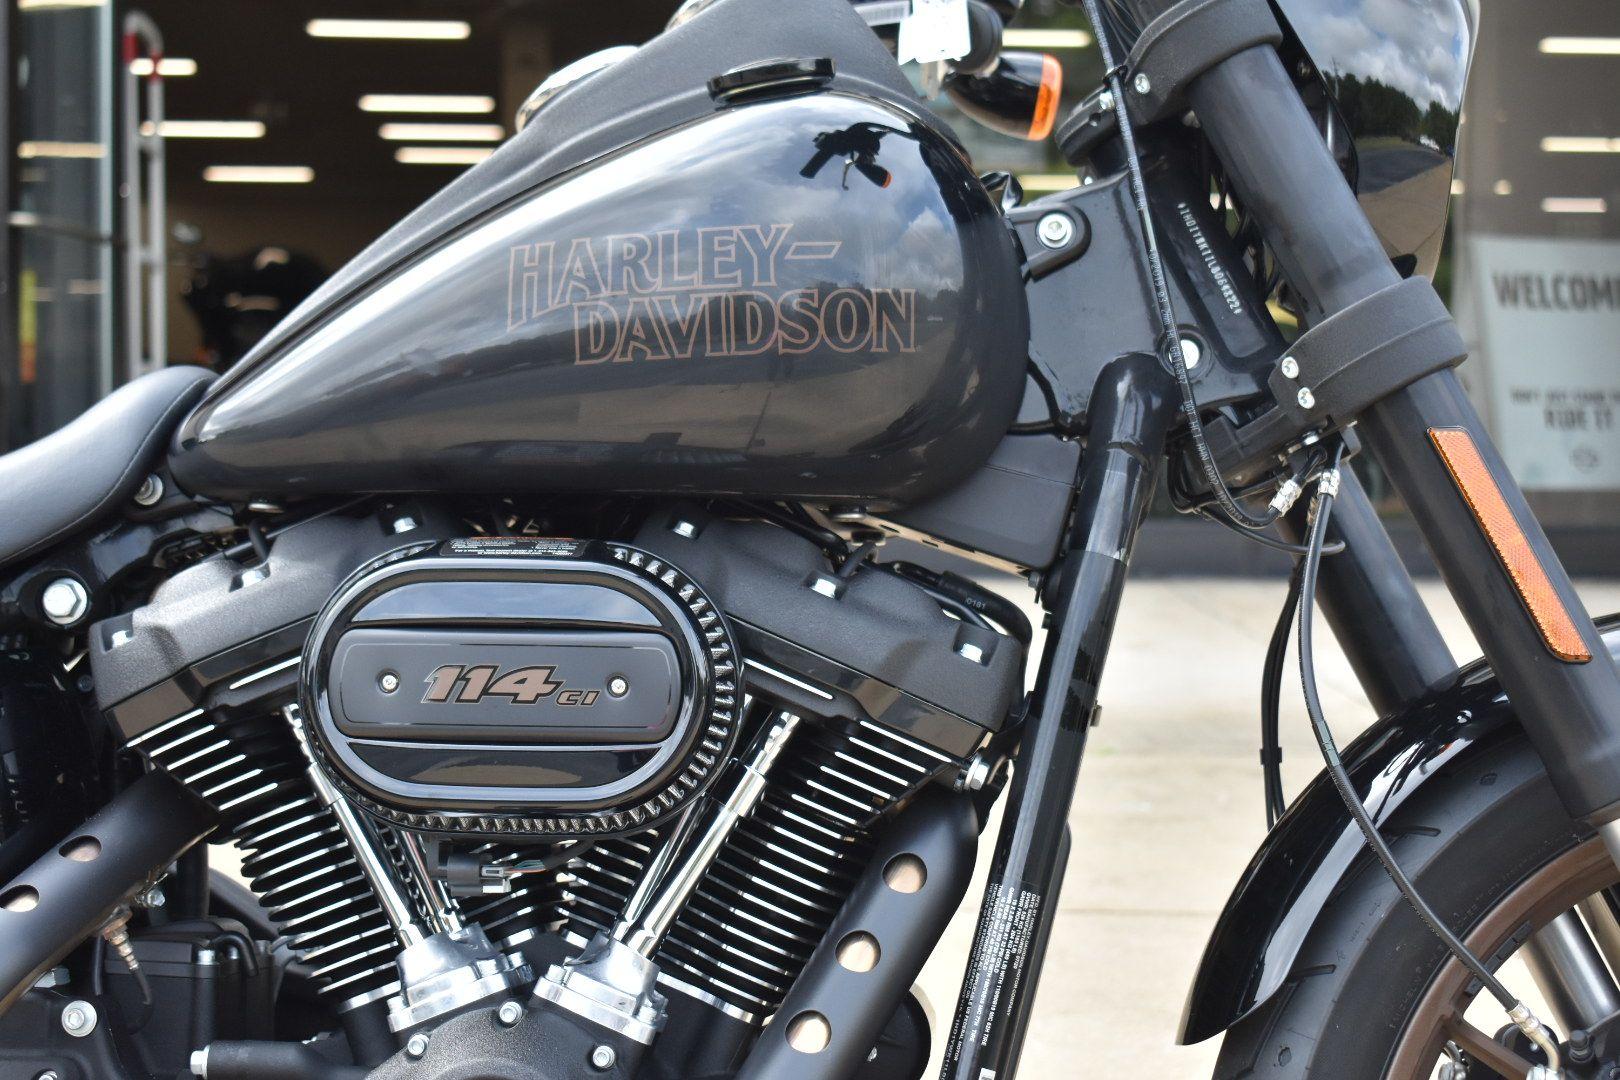 New 2020 Harley-Davidson Low Rider S FXLRS